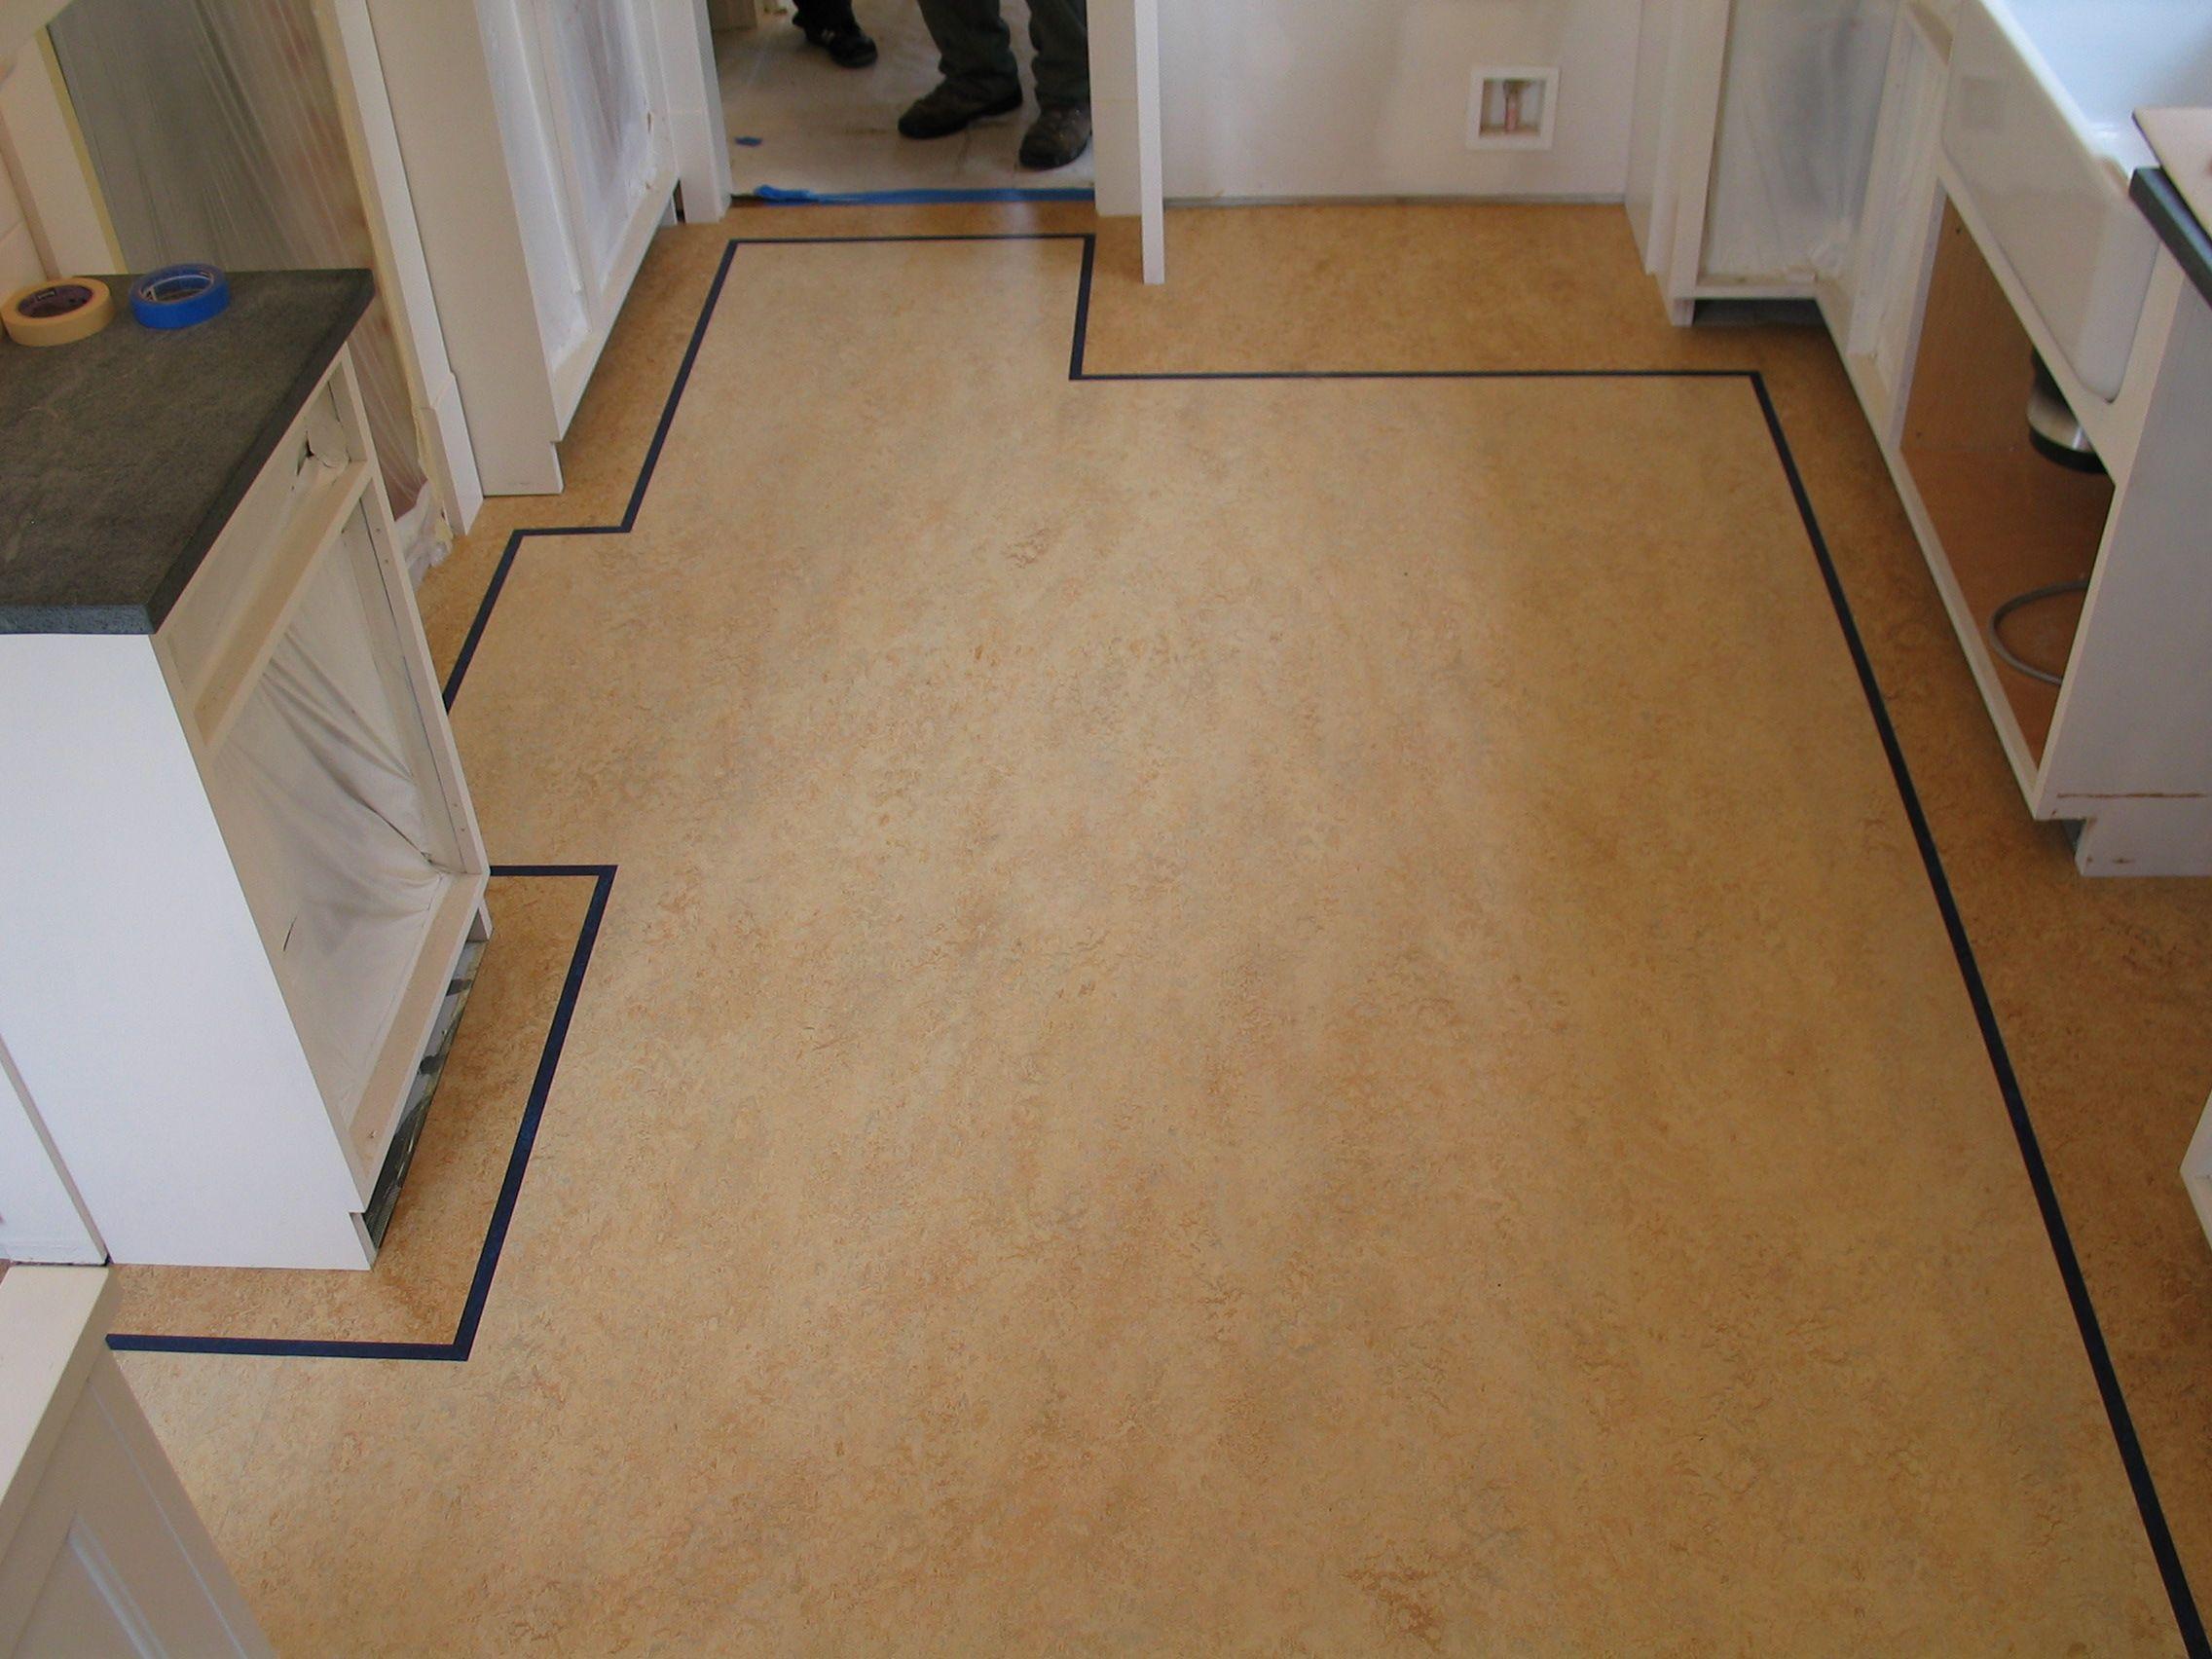 Marmoleum Kitchen Floor With Custom Border Completed By Interior Floor Designs Seattle Wa Floor Design Interior Floor Marmoleum